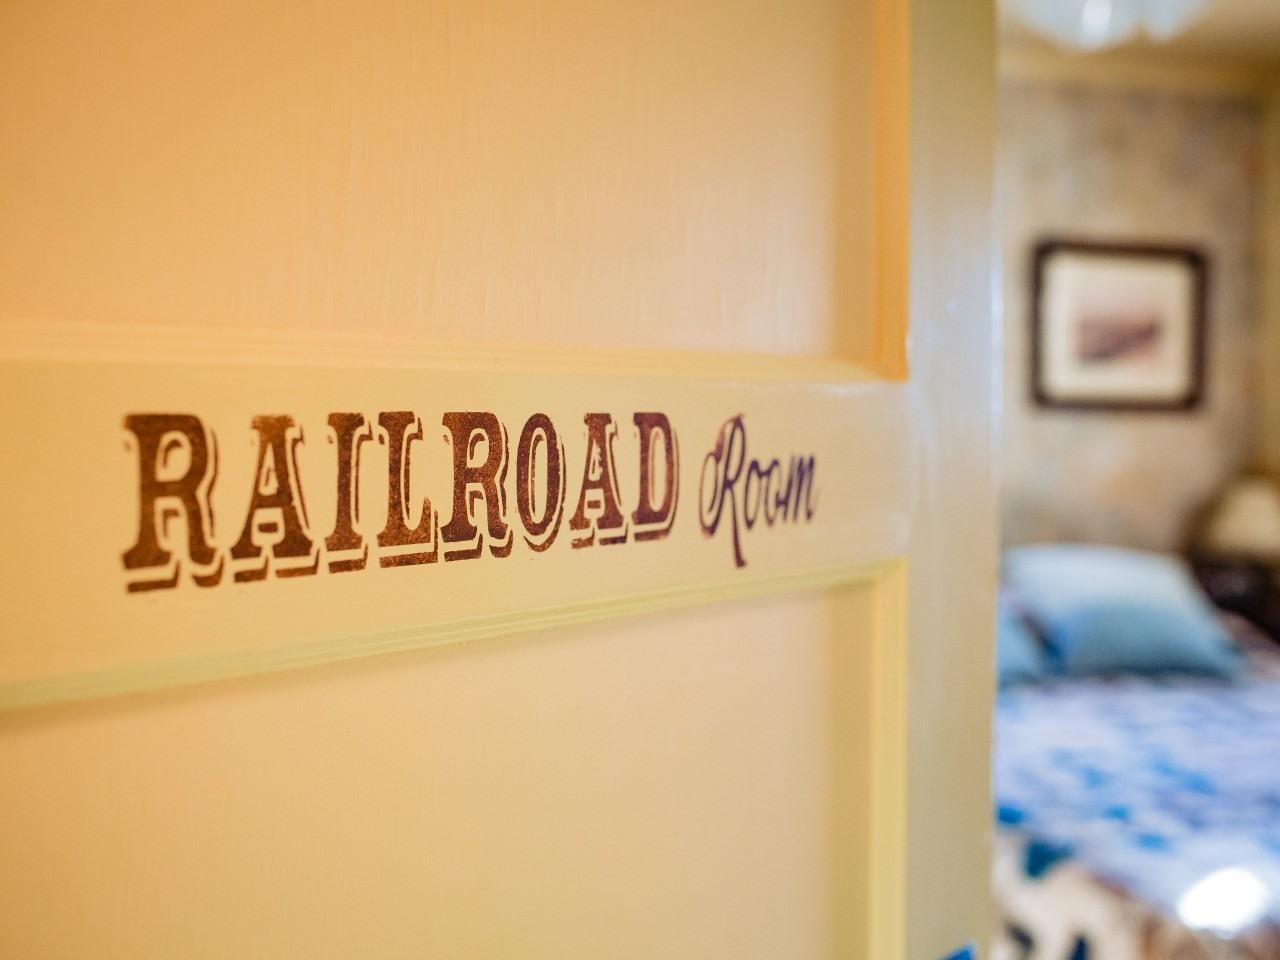 Railroad Room.